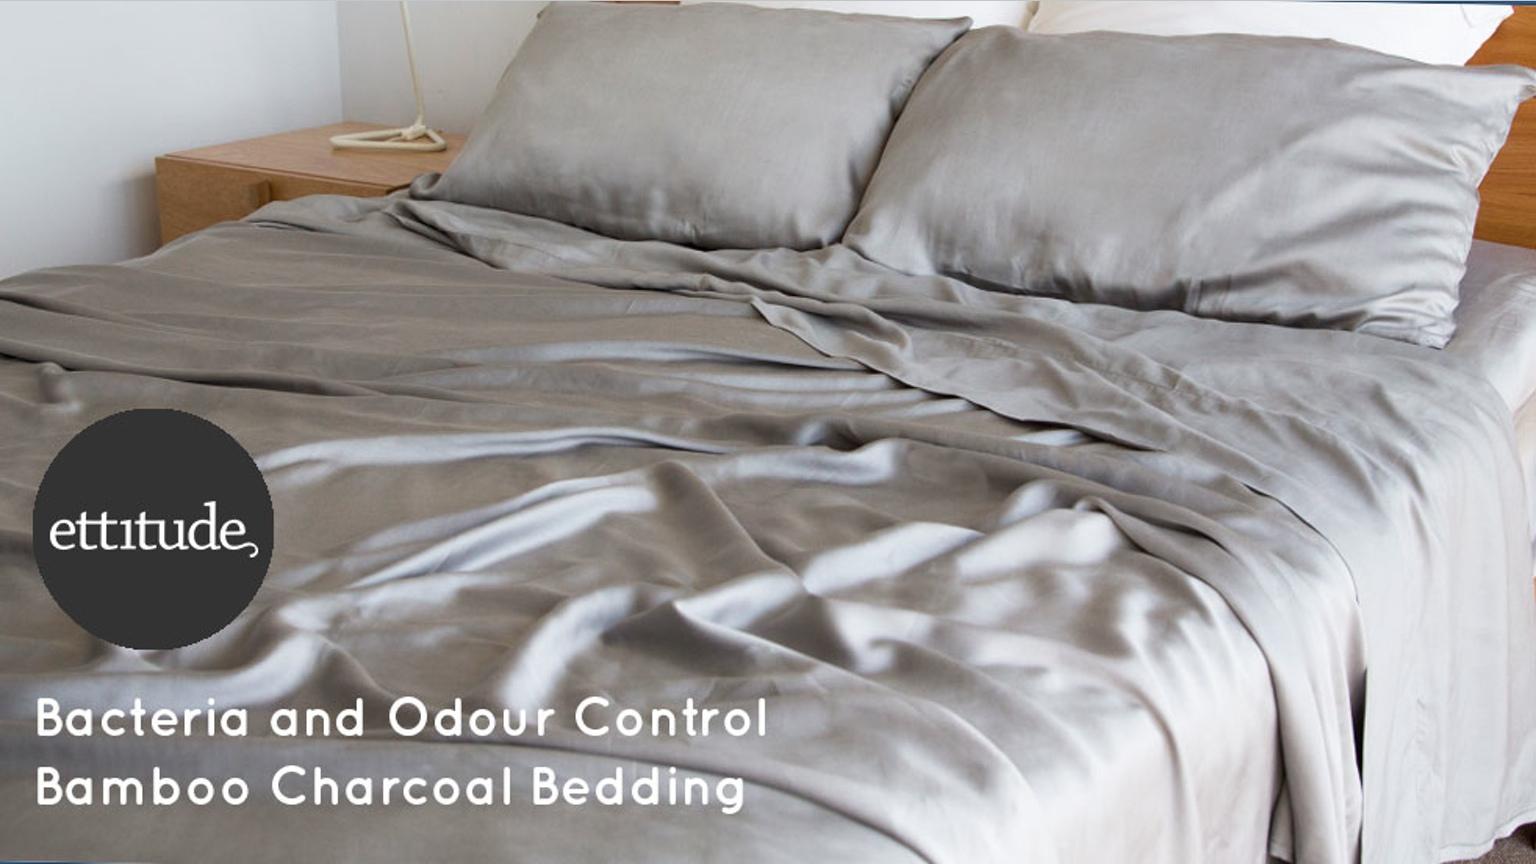 ettitude bedding